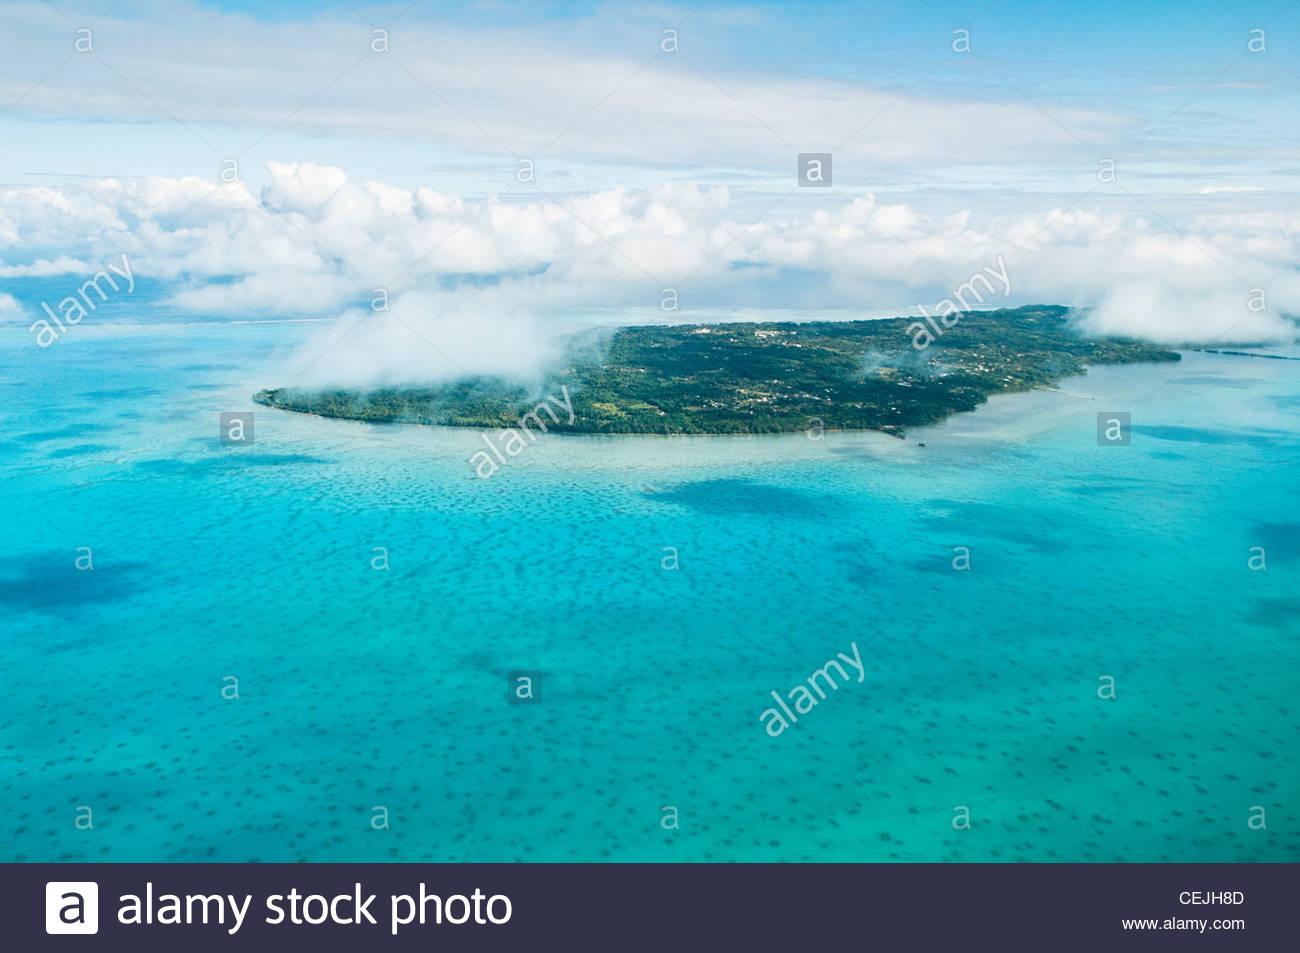 Aerial view of lagoon and Aitutaki Island, Cook Islands. - Stock Image